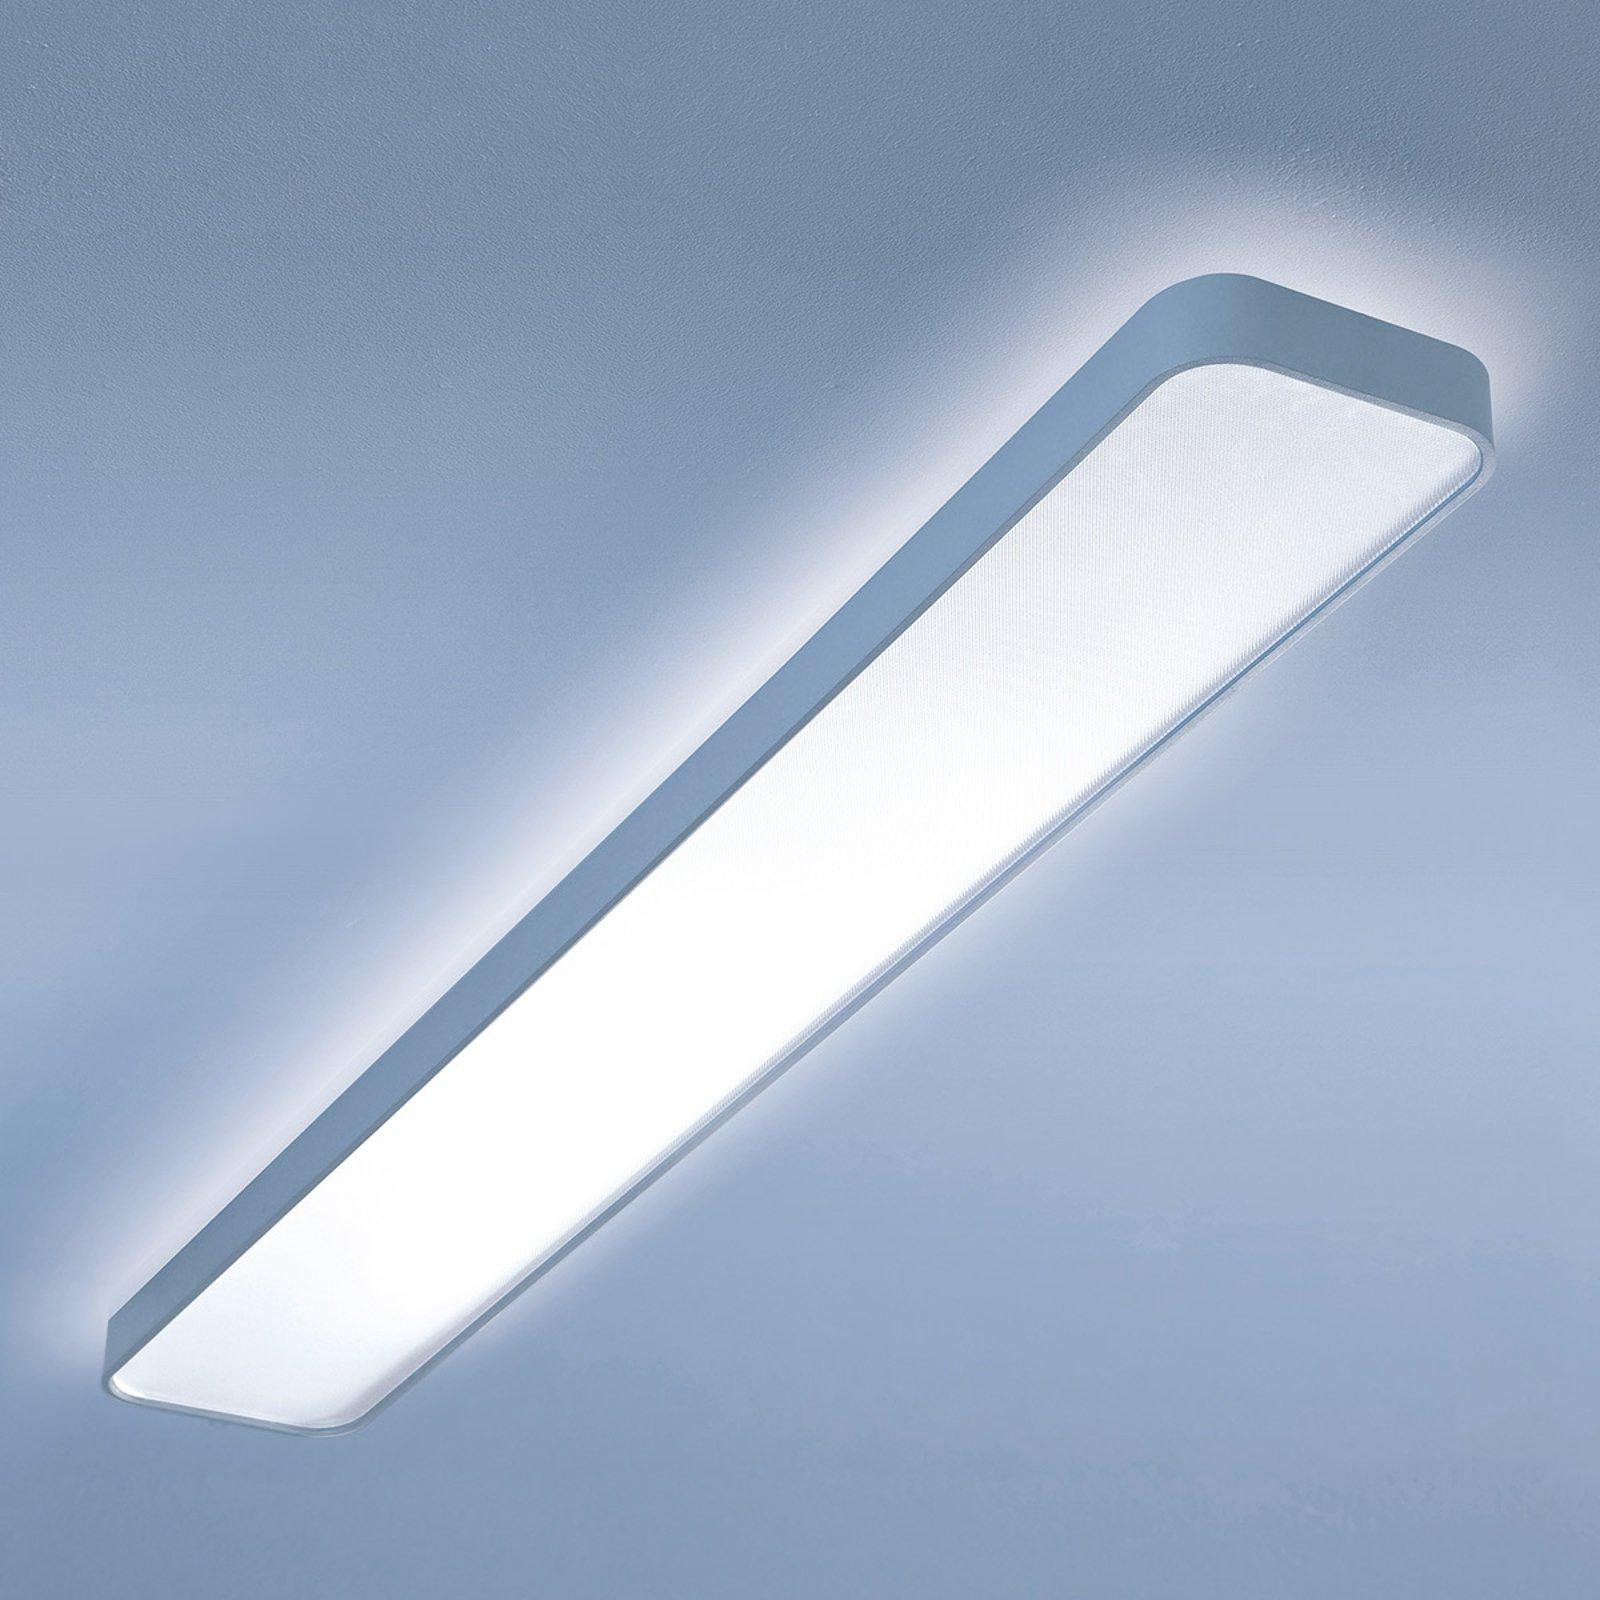 Caleo-X1 universalhvit LED-taklampe 150 cm